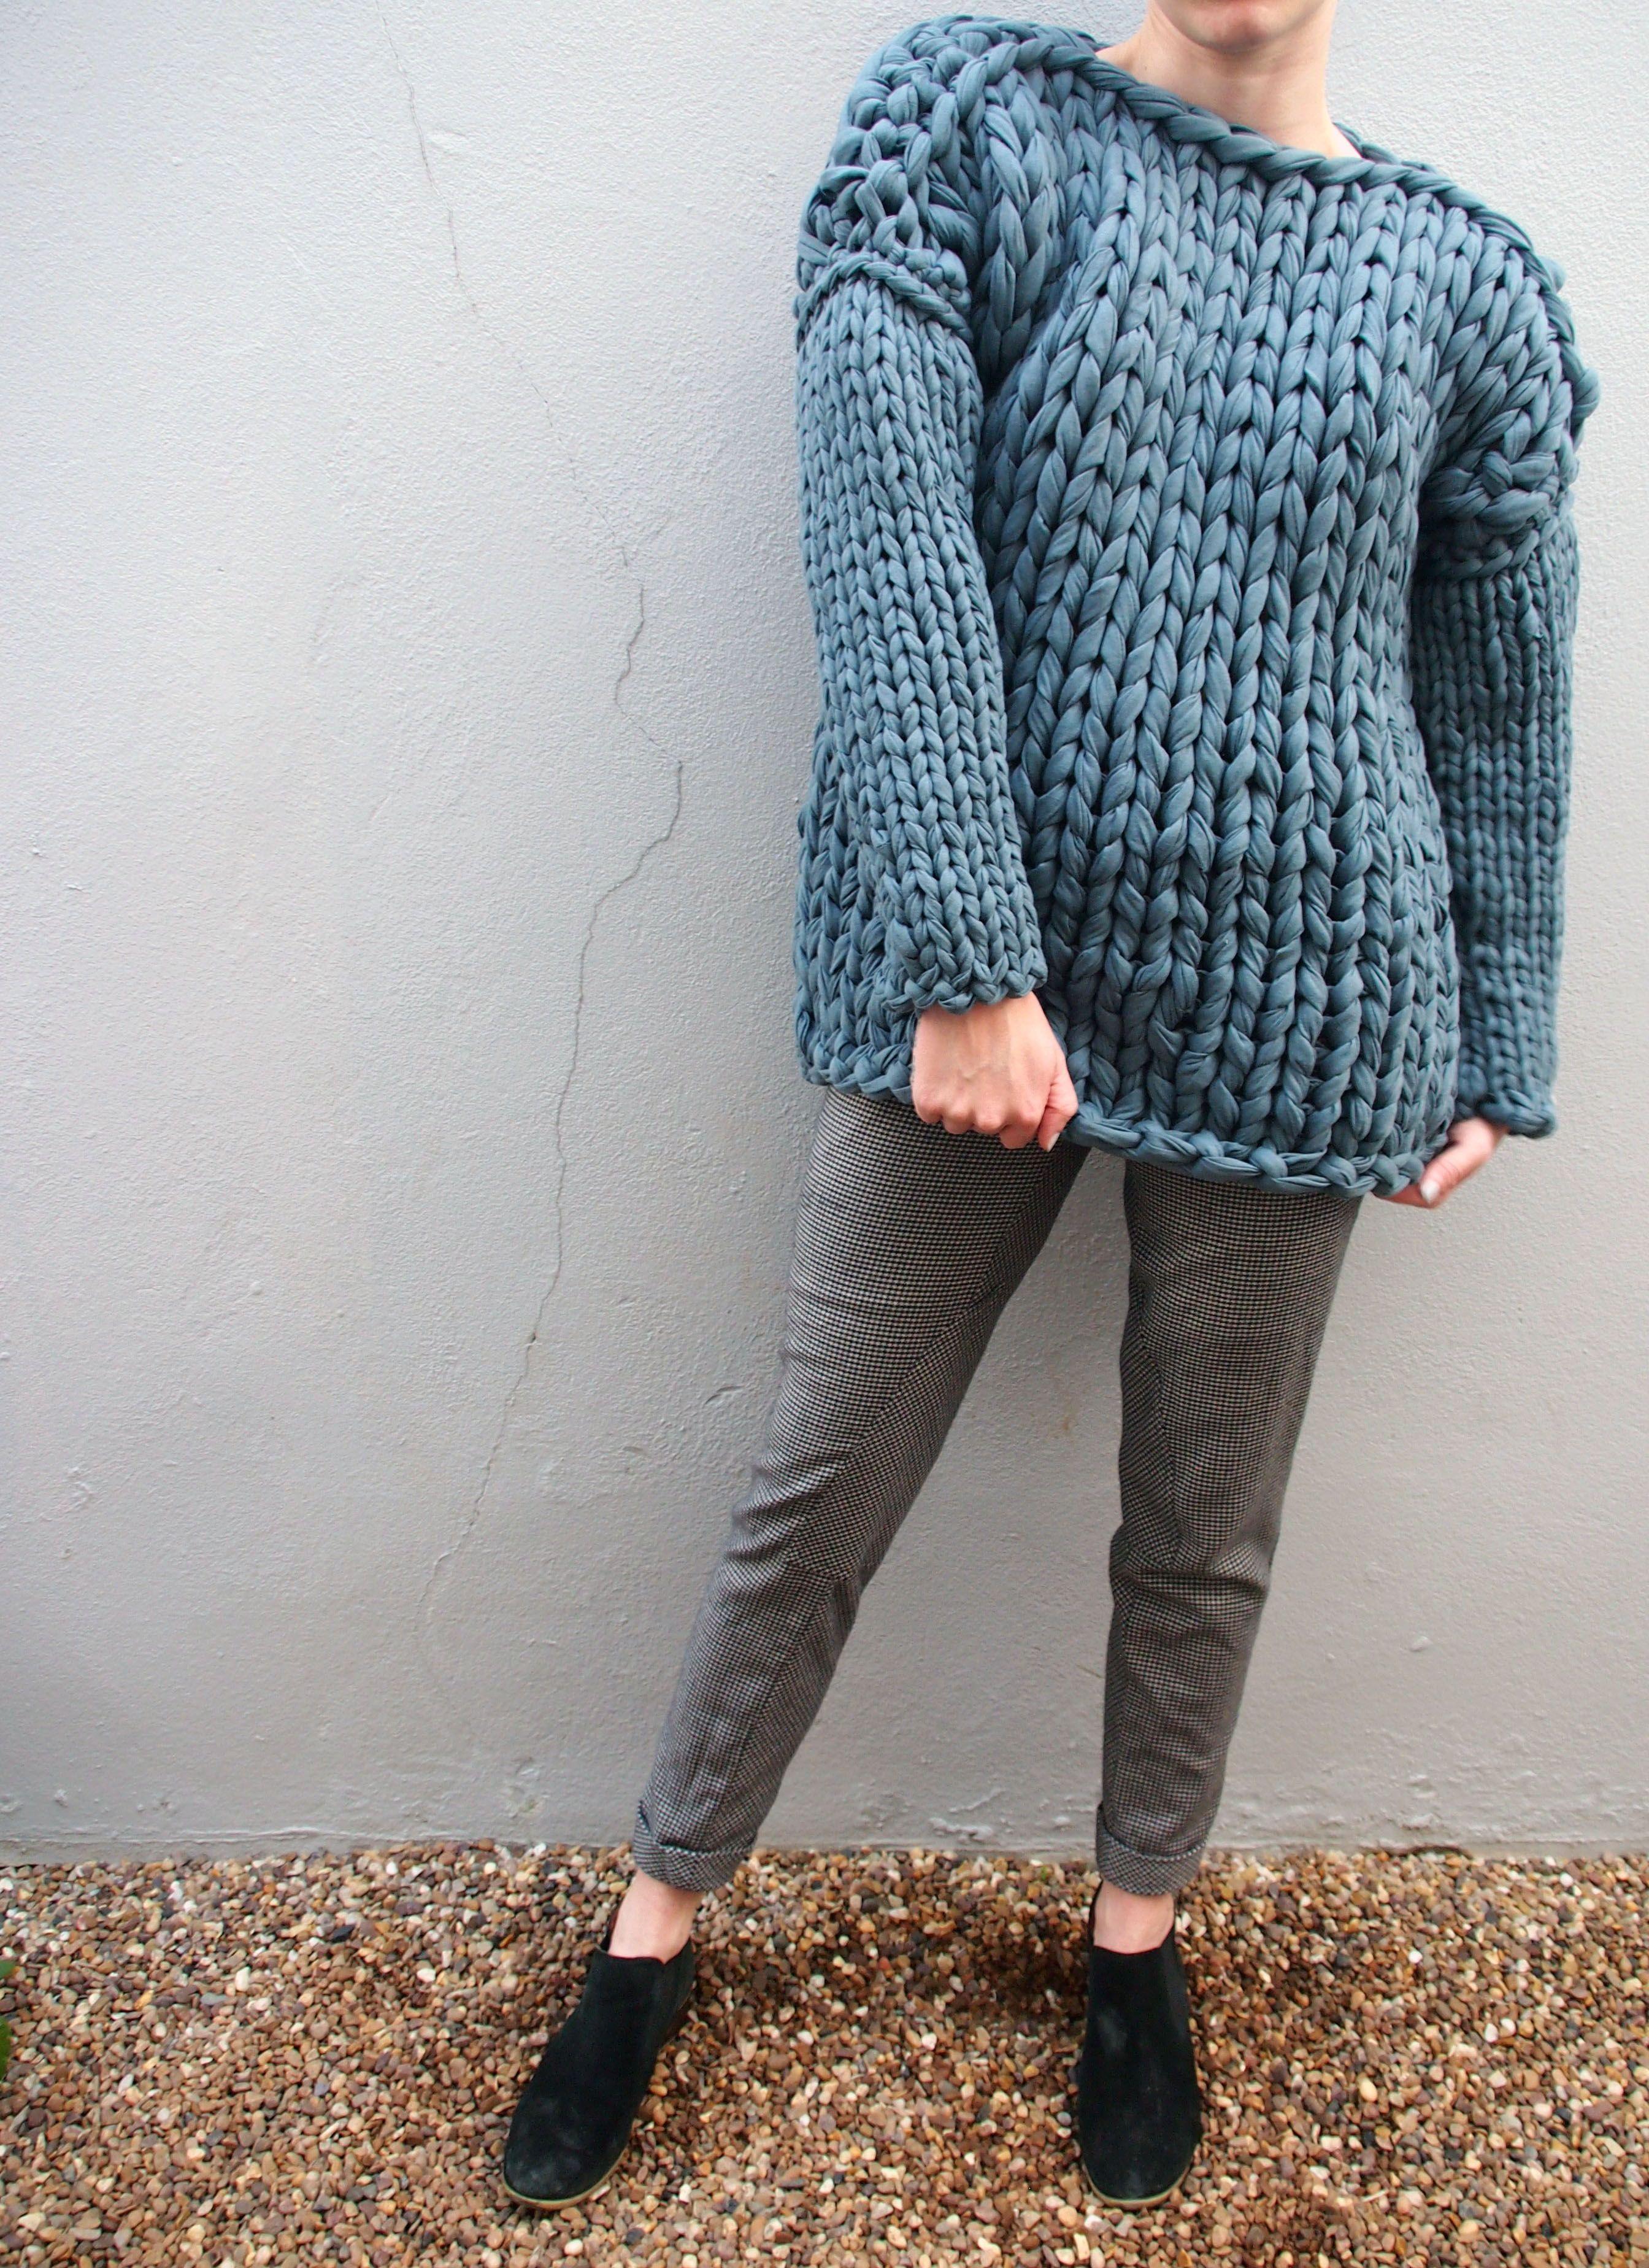 65c2179365a8 Gender fluid ZERO slate knit jumper. Available now www.xandrajane.com shop